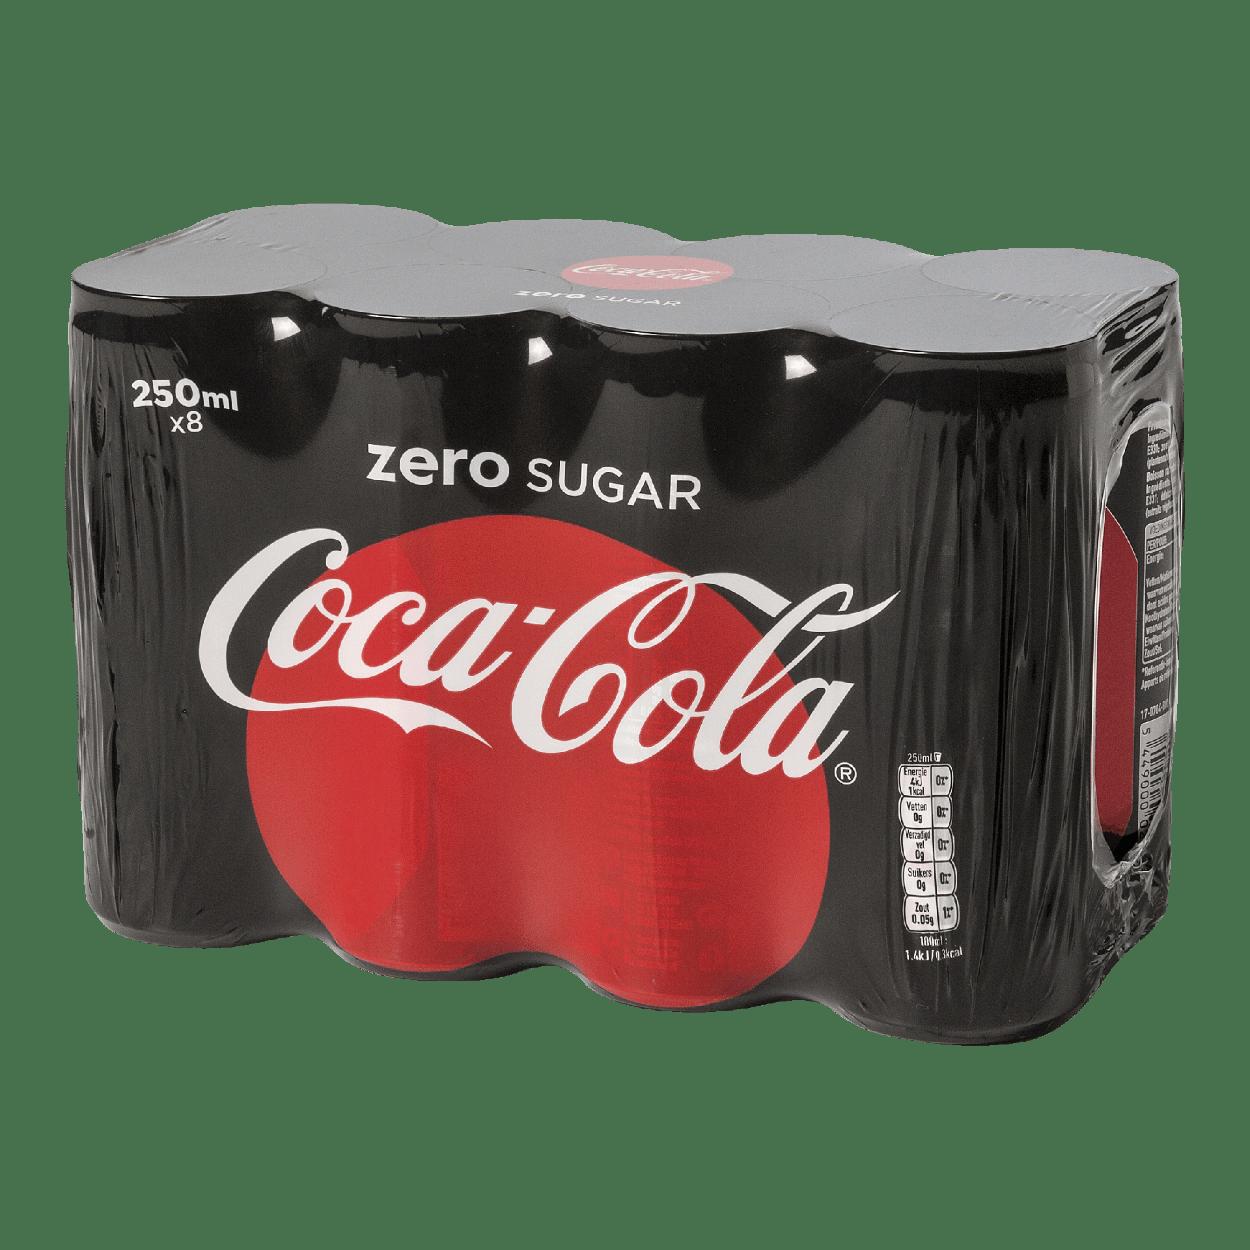 aldi coca cola price